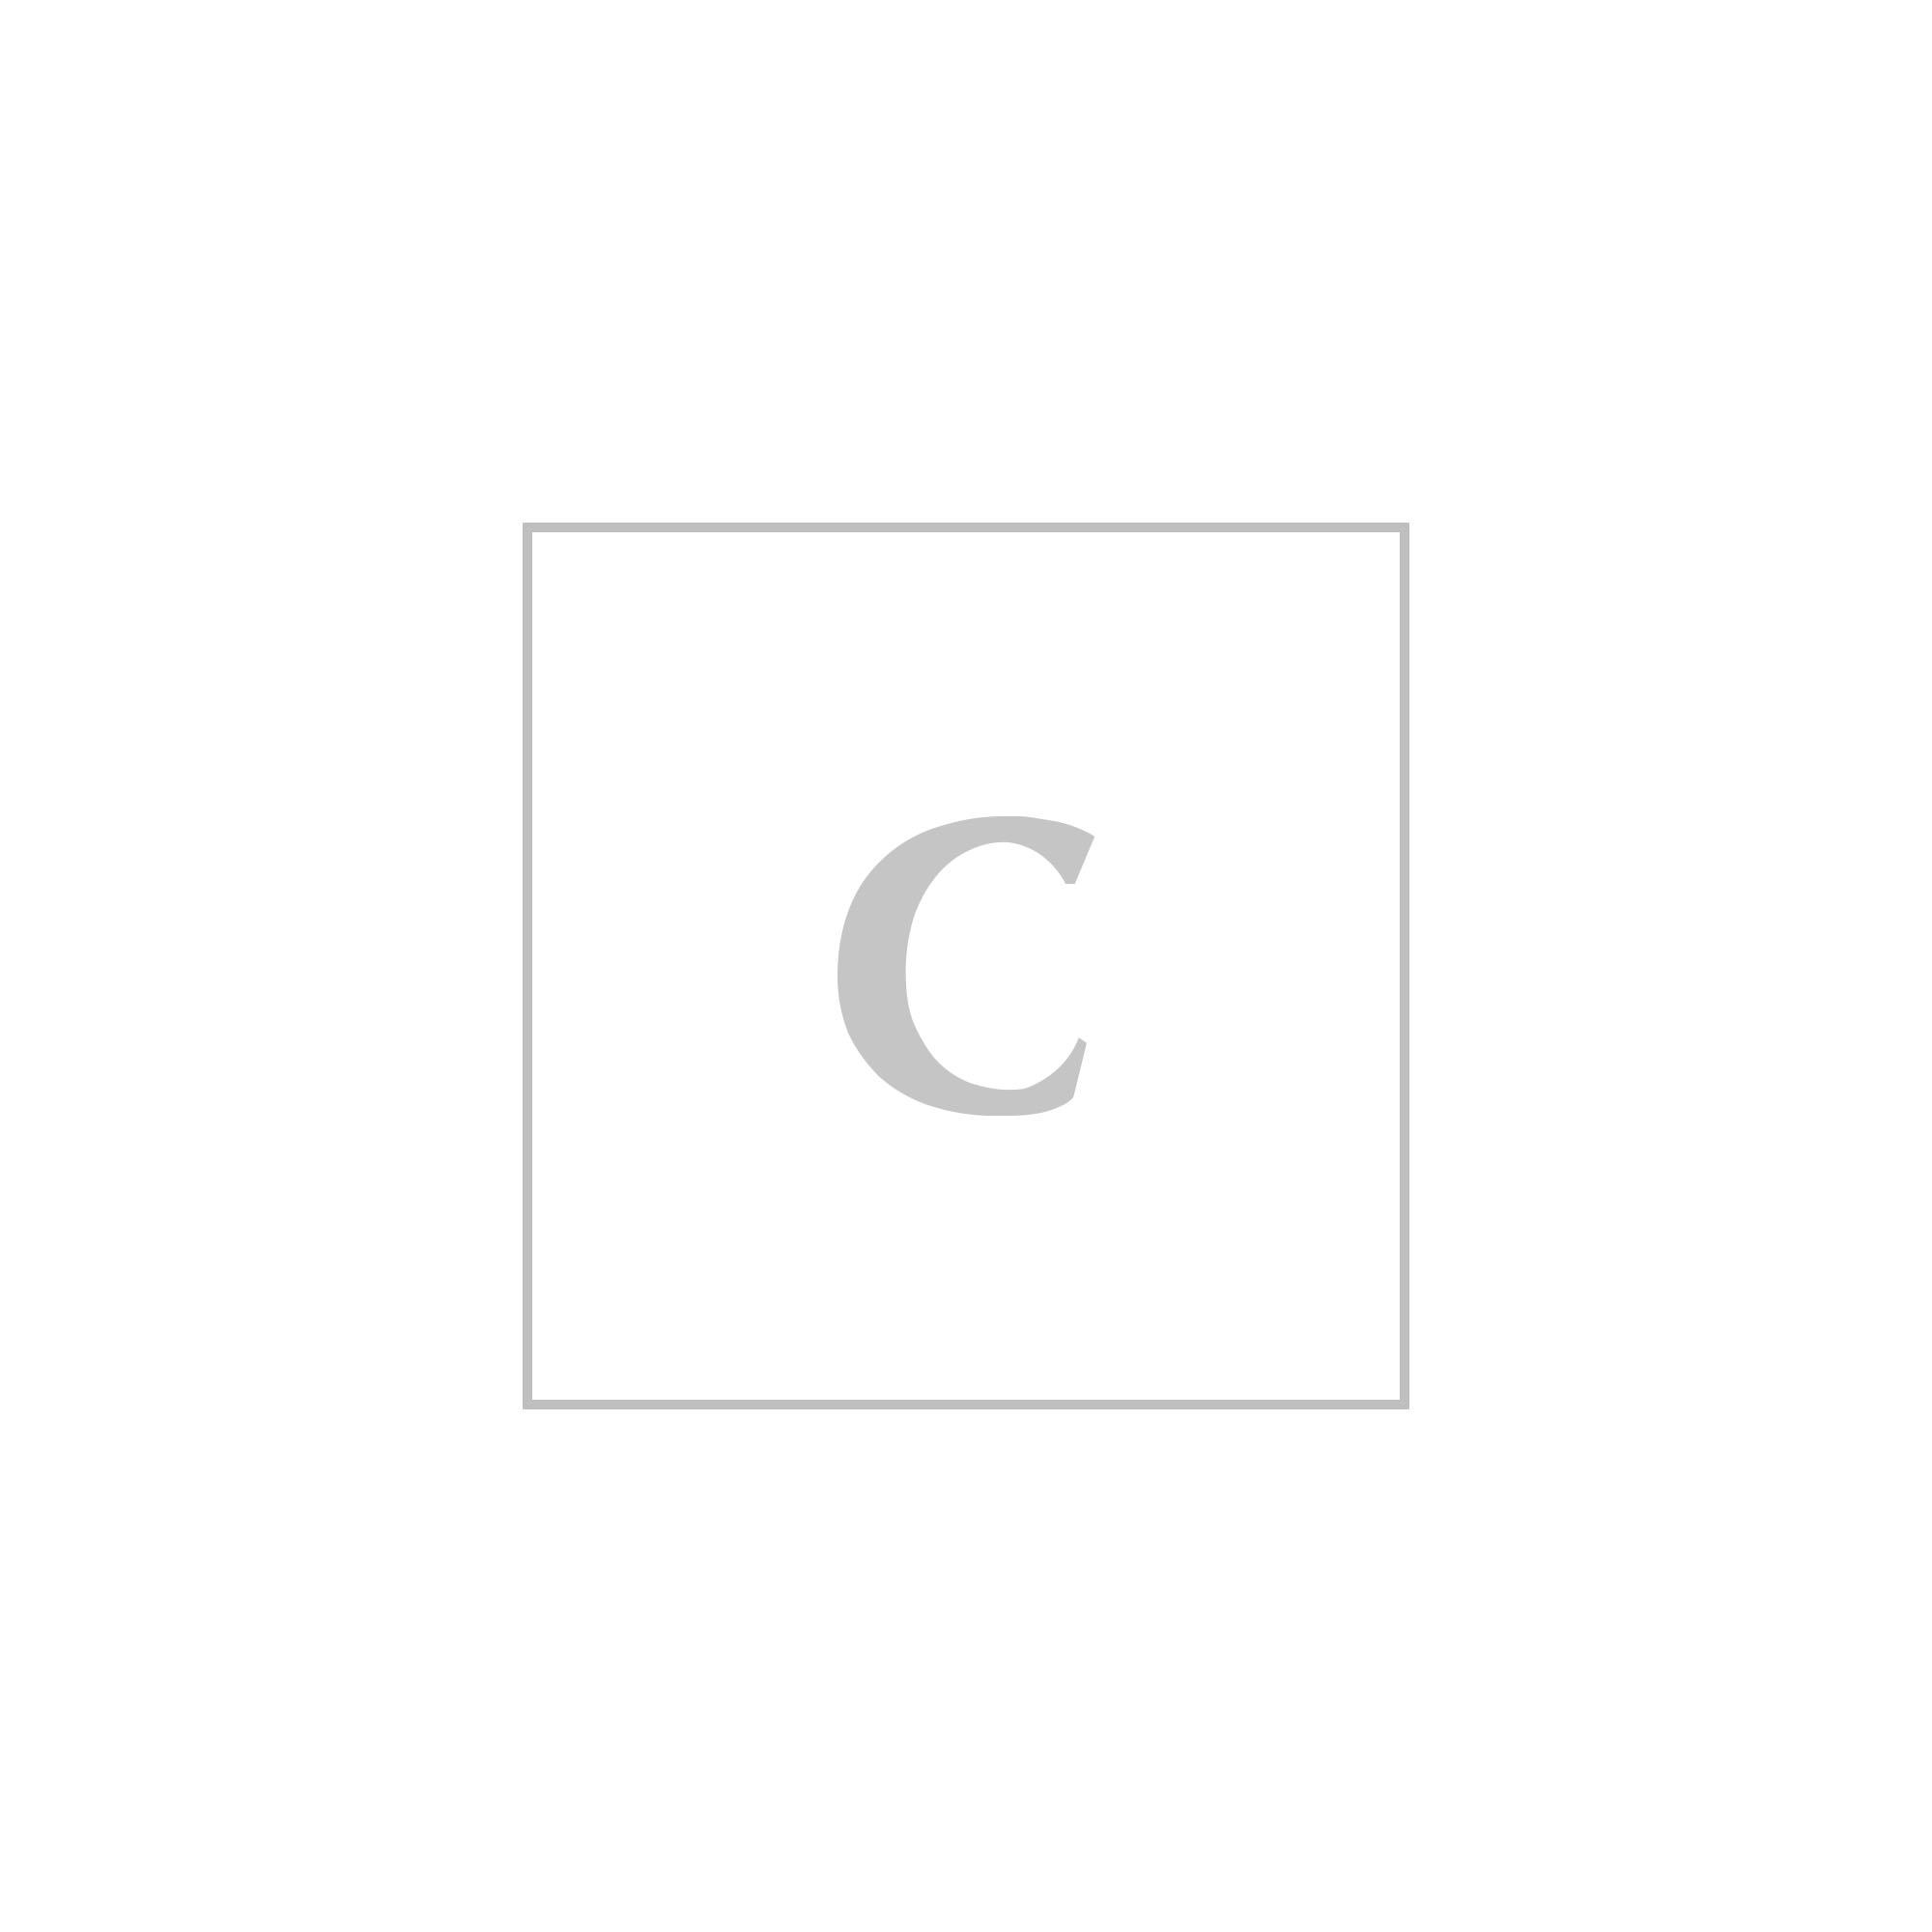 Burberry impermeabile kensington corto